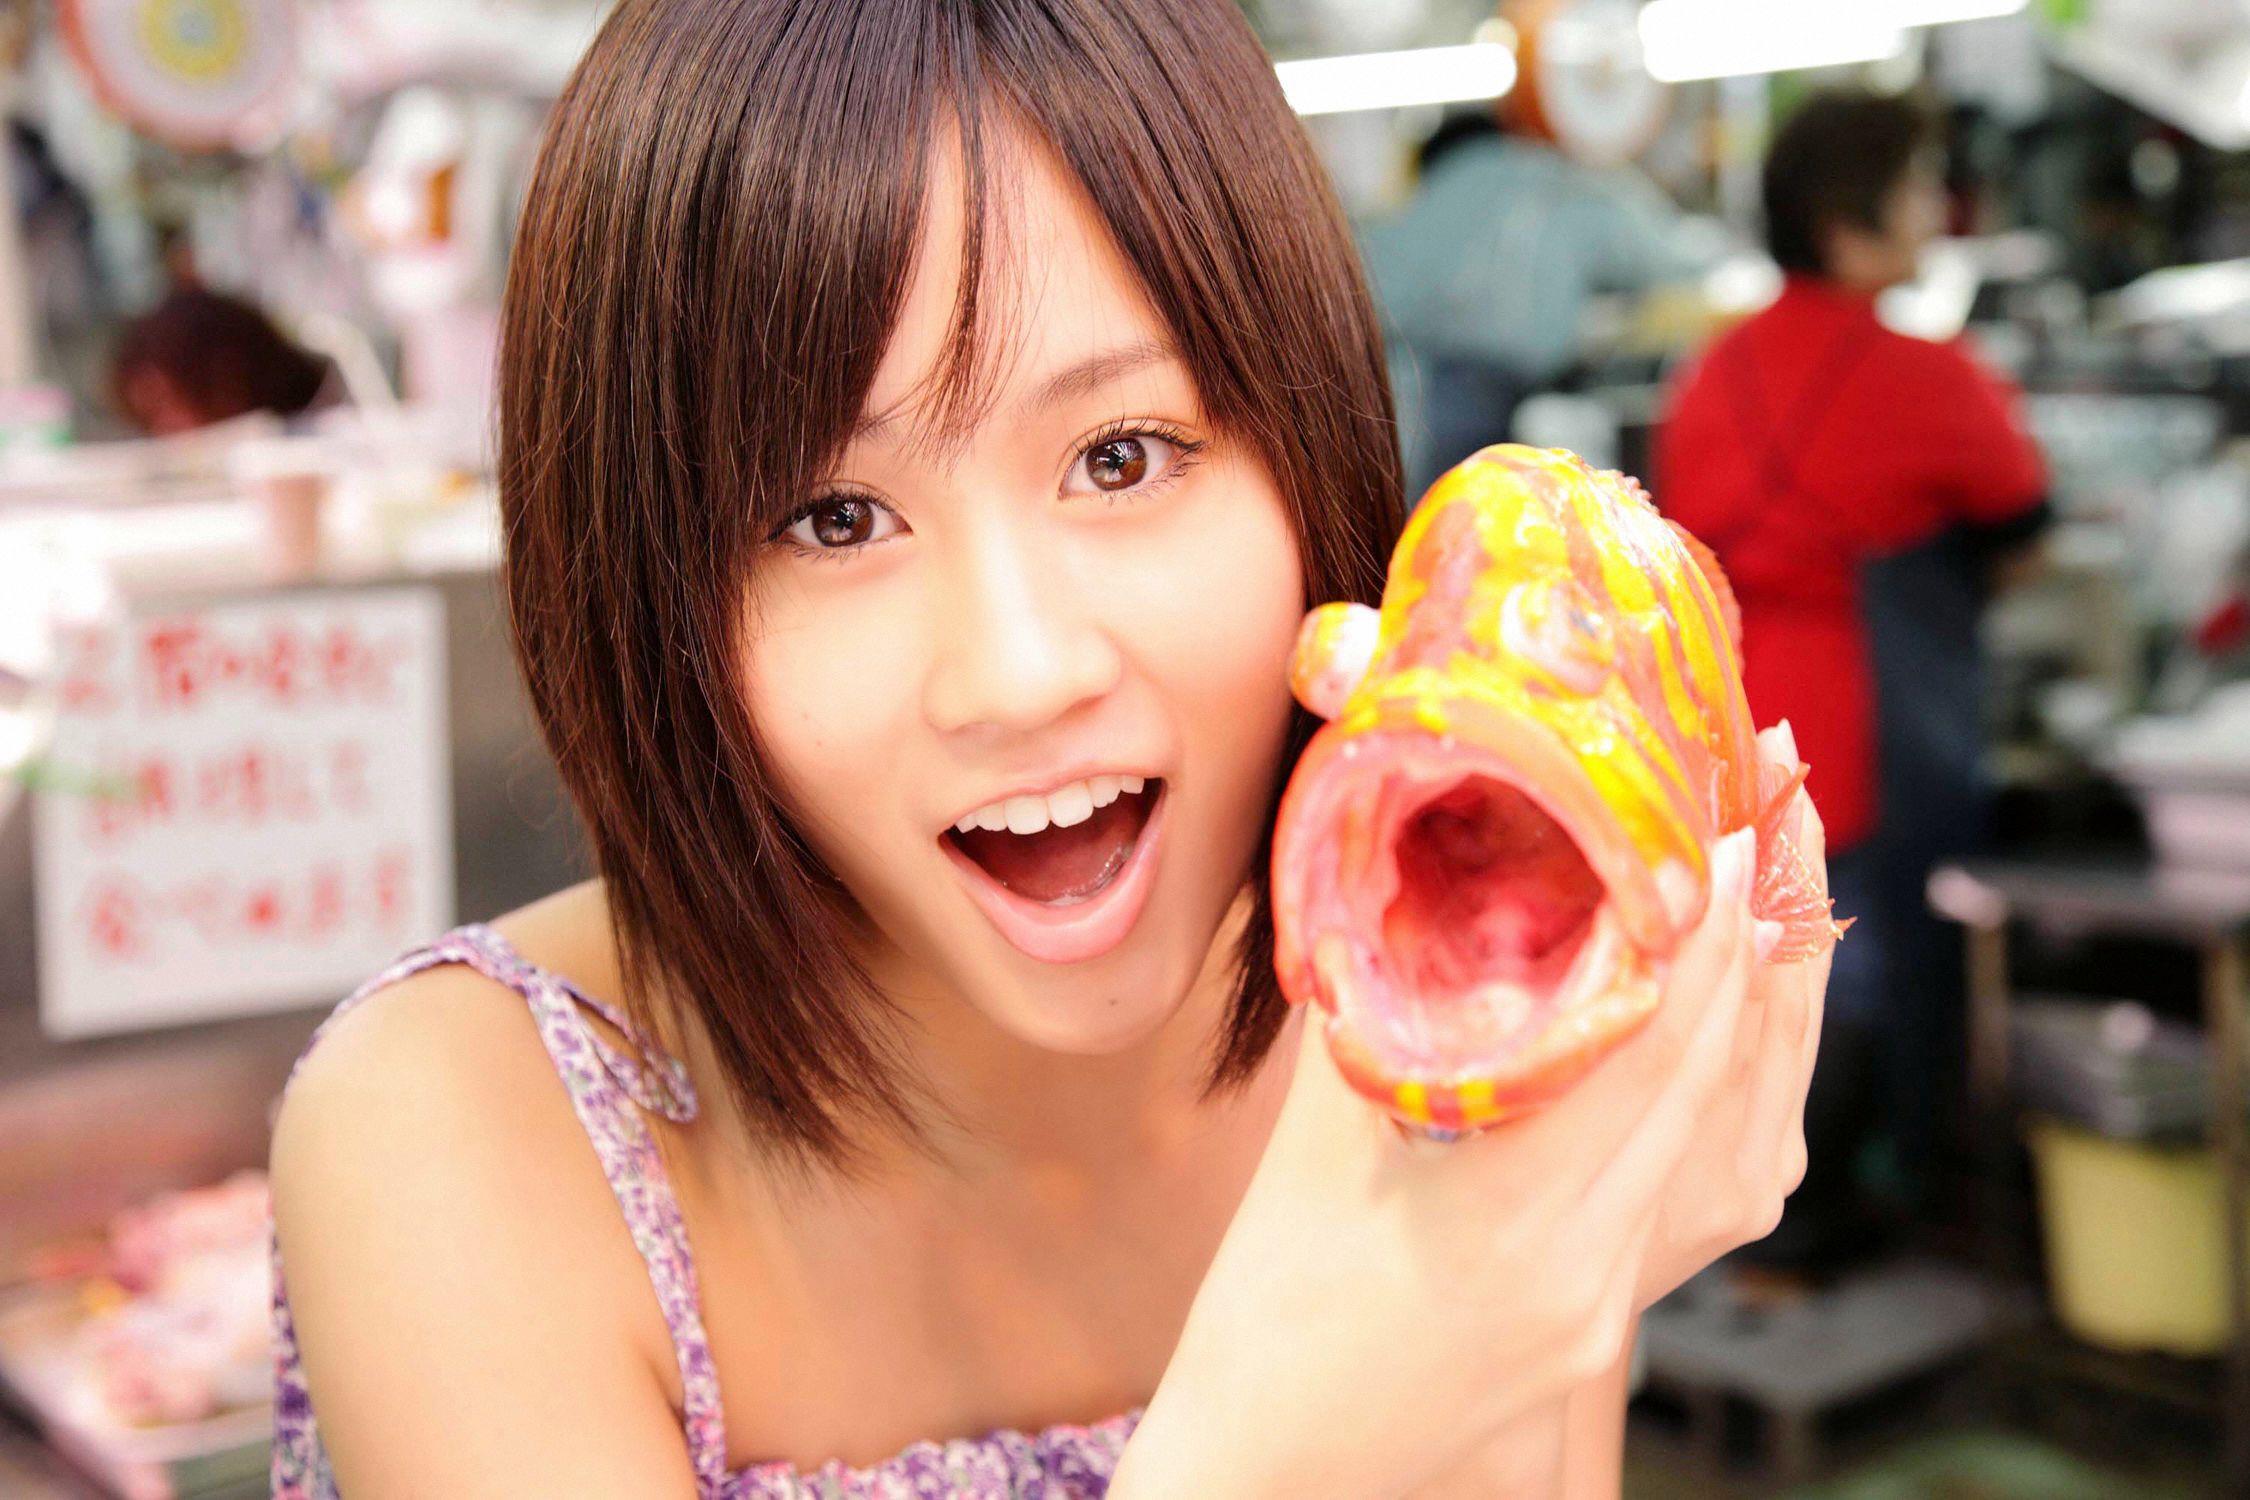 前田敦子 エロ画像 54